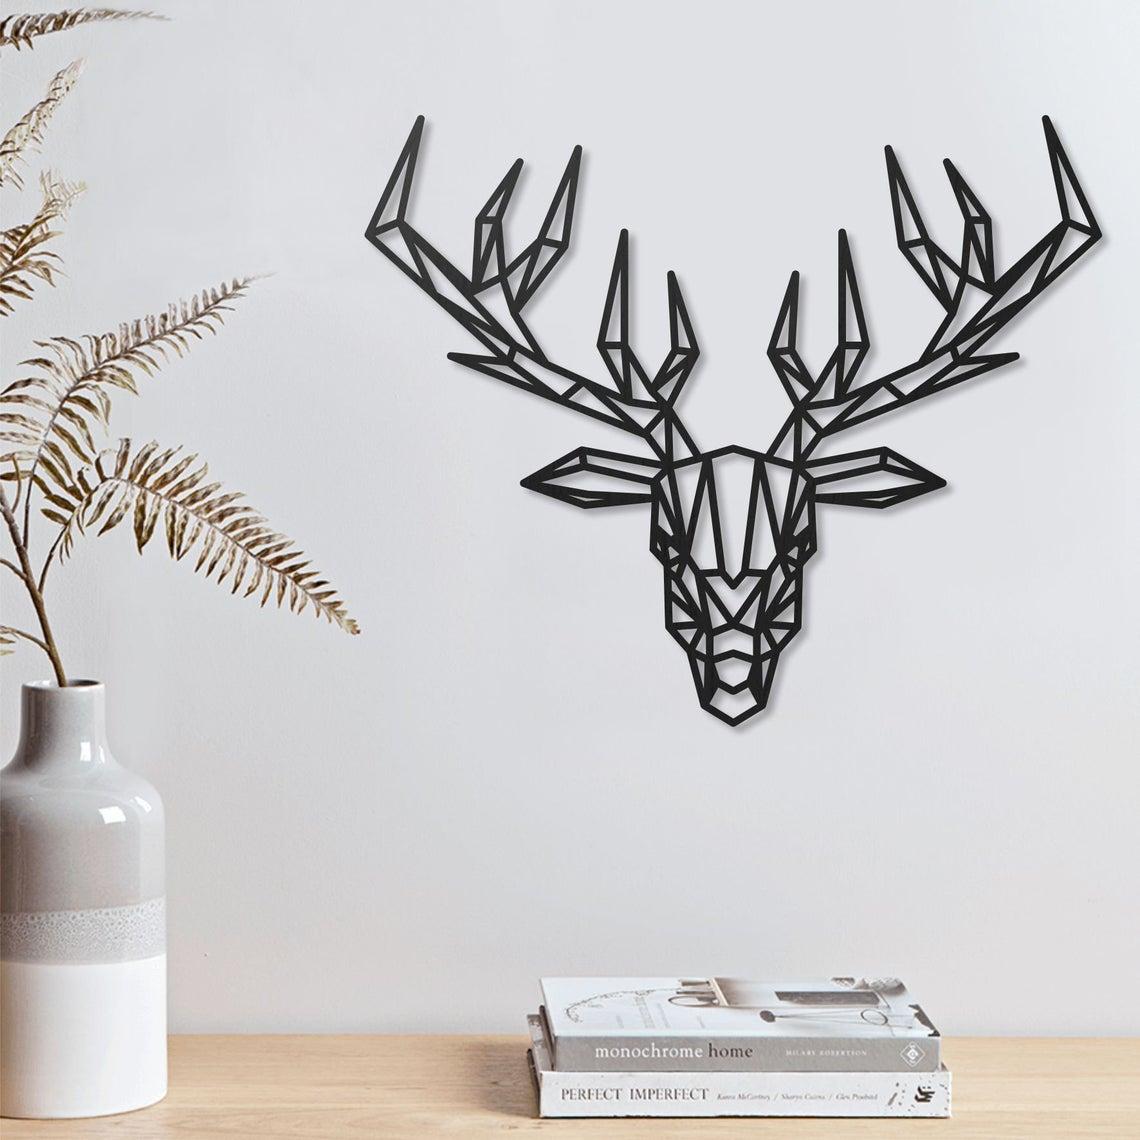 Laser Cut Deer Geometric Polygonal Modern Decor Animal Wall Art DXF File